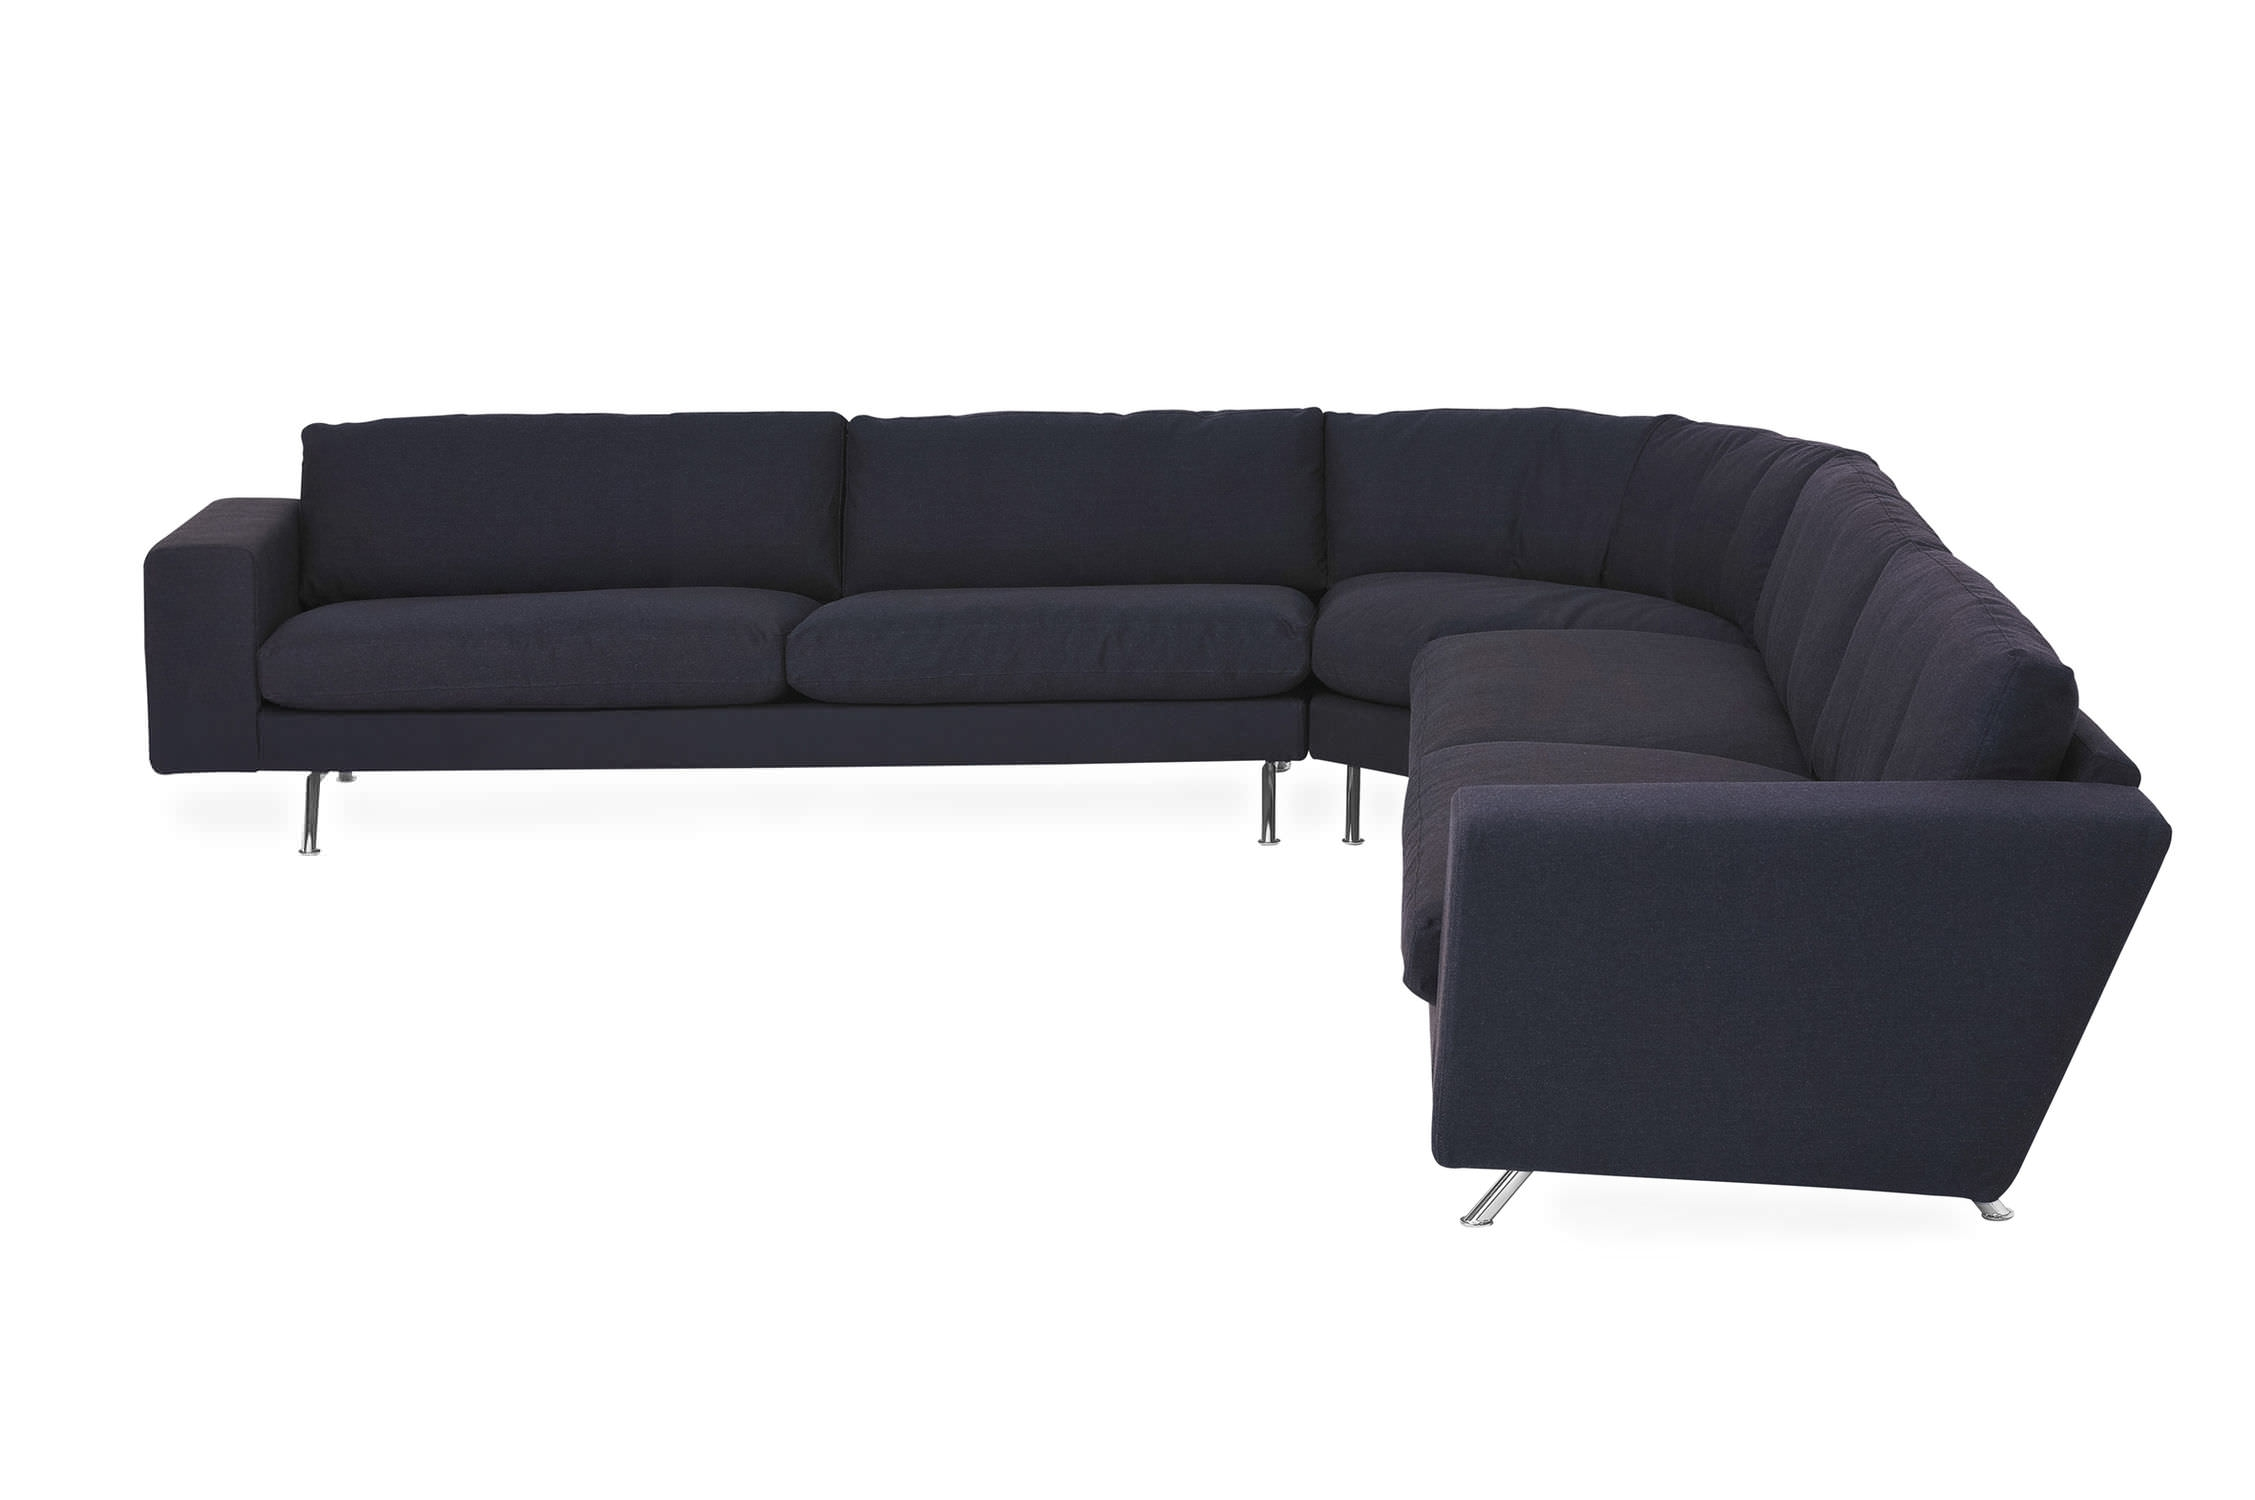 Modular Sofa Corner Contemporary Fabric Chill Carl In Modular Corner Sofas (Image 12 of 15)